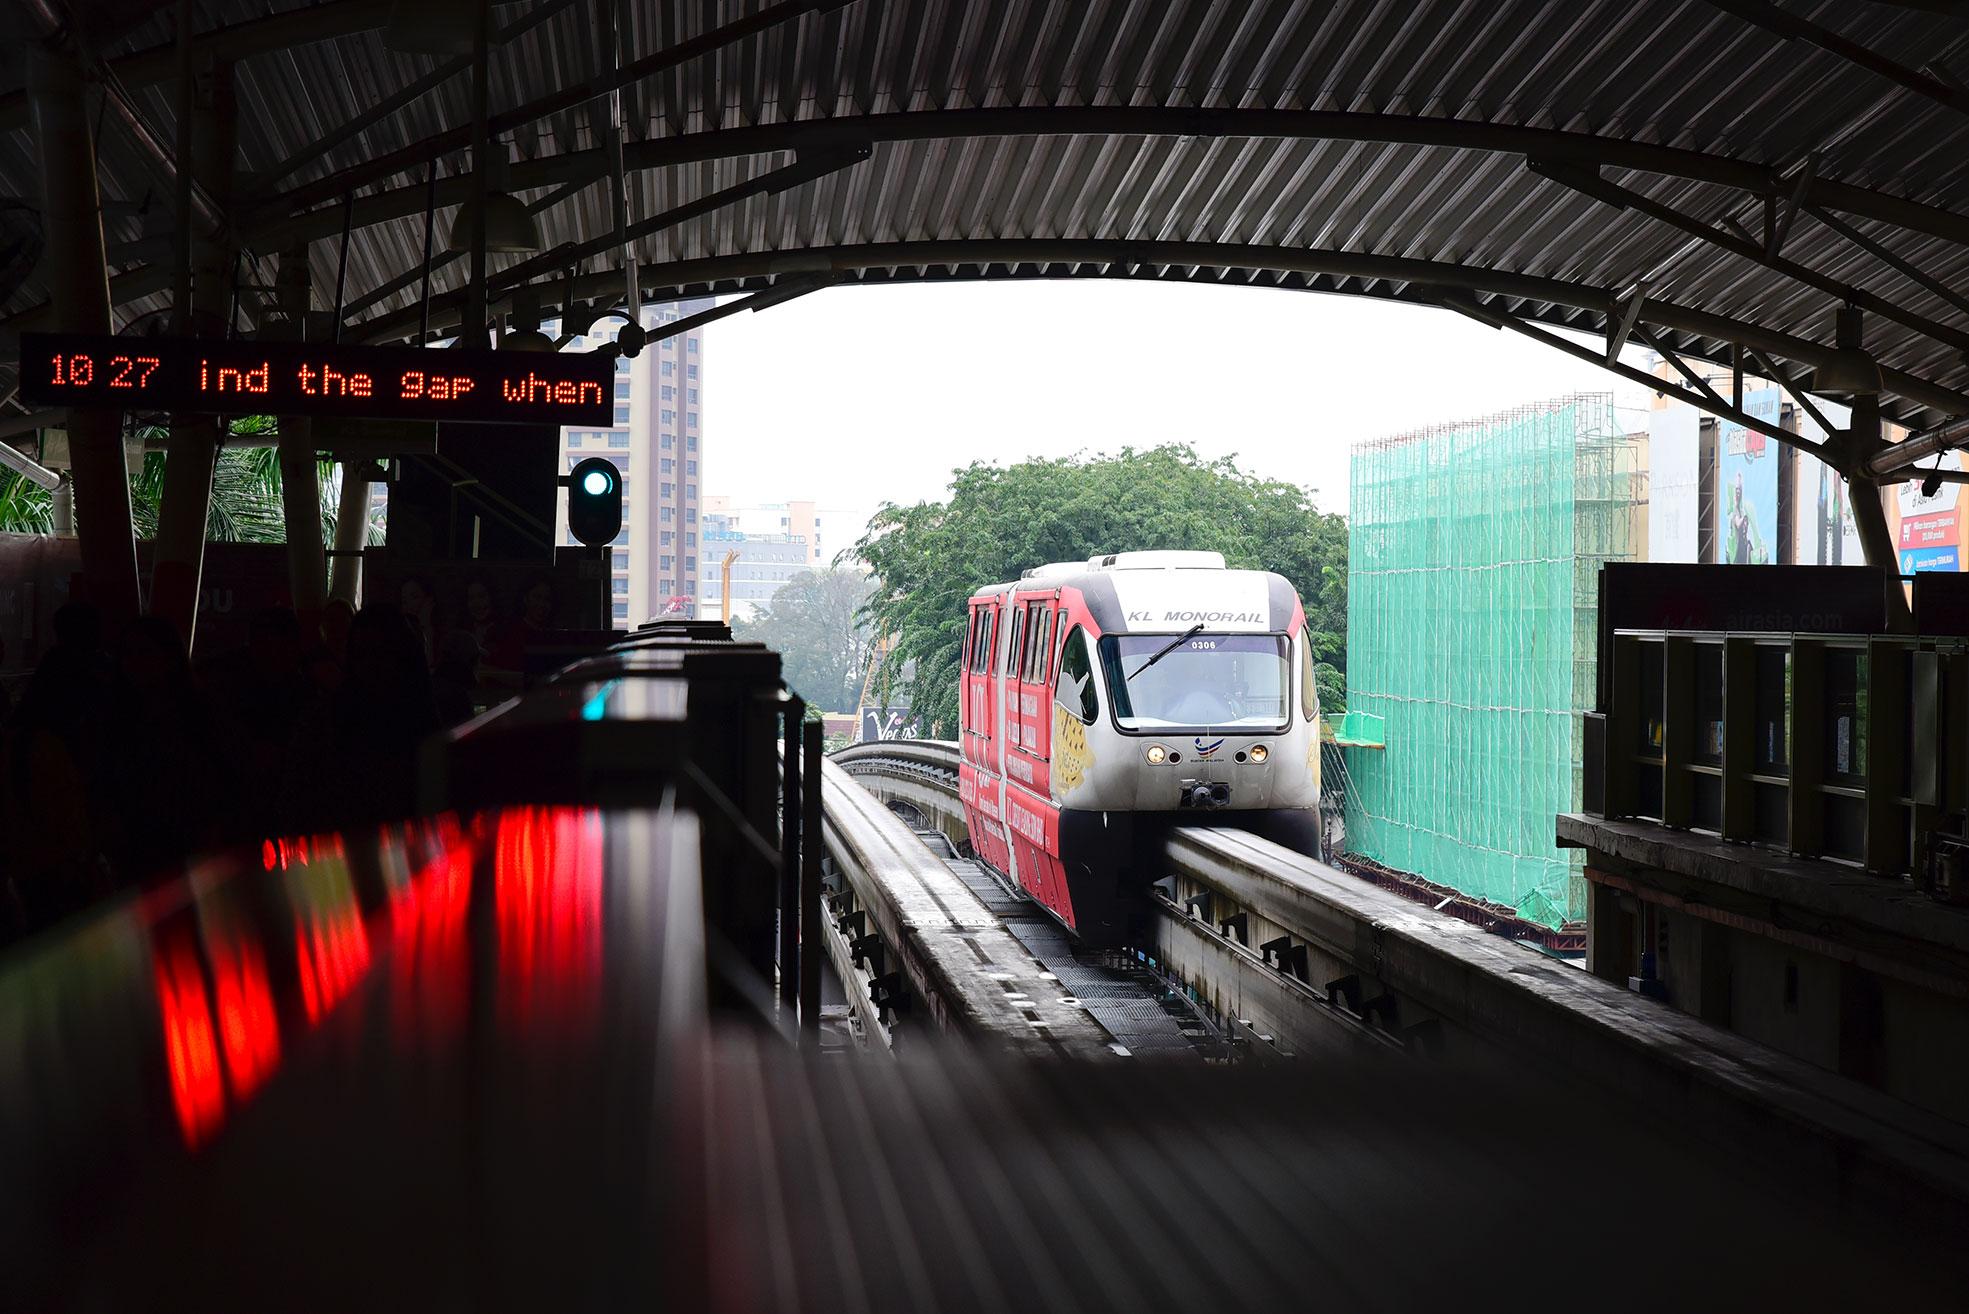 KL Sky Train